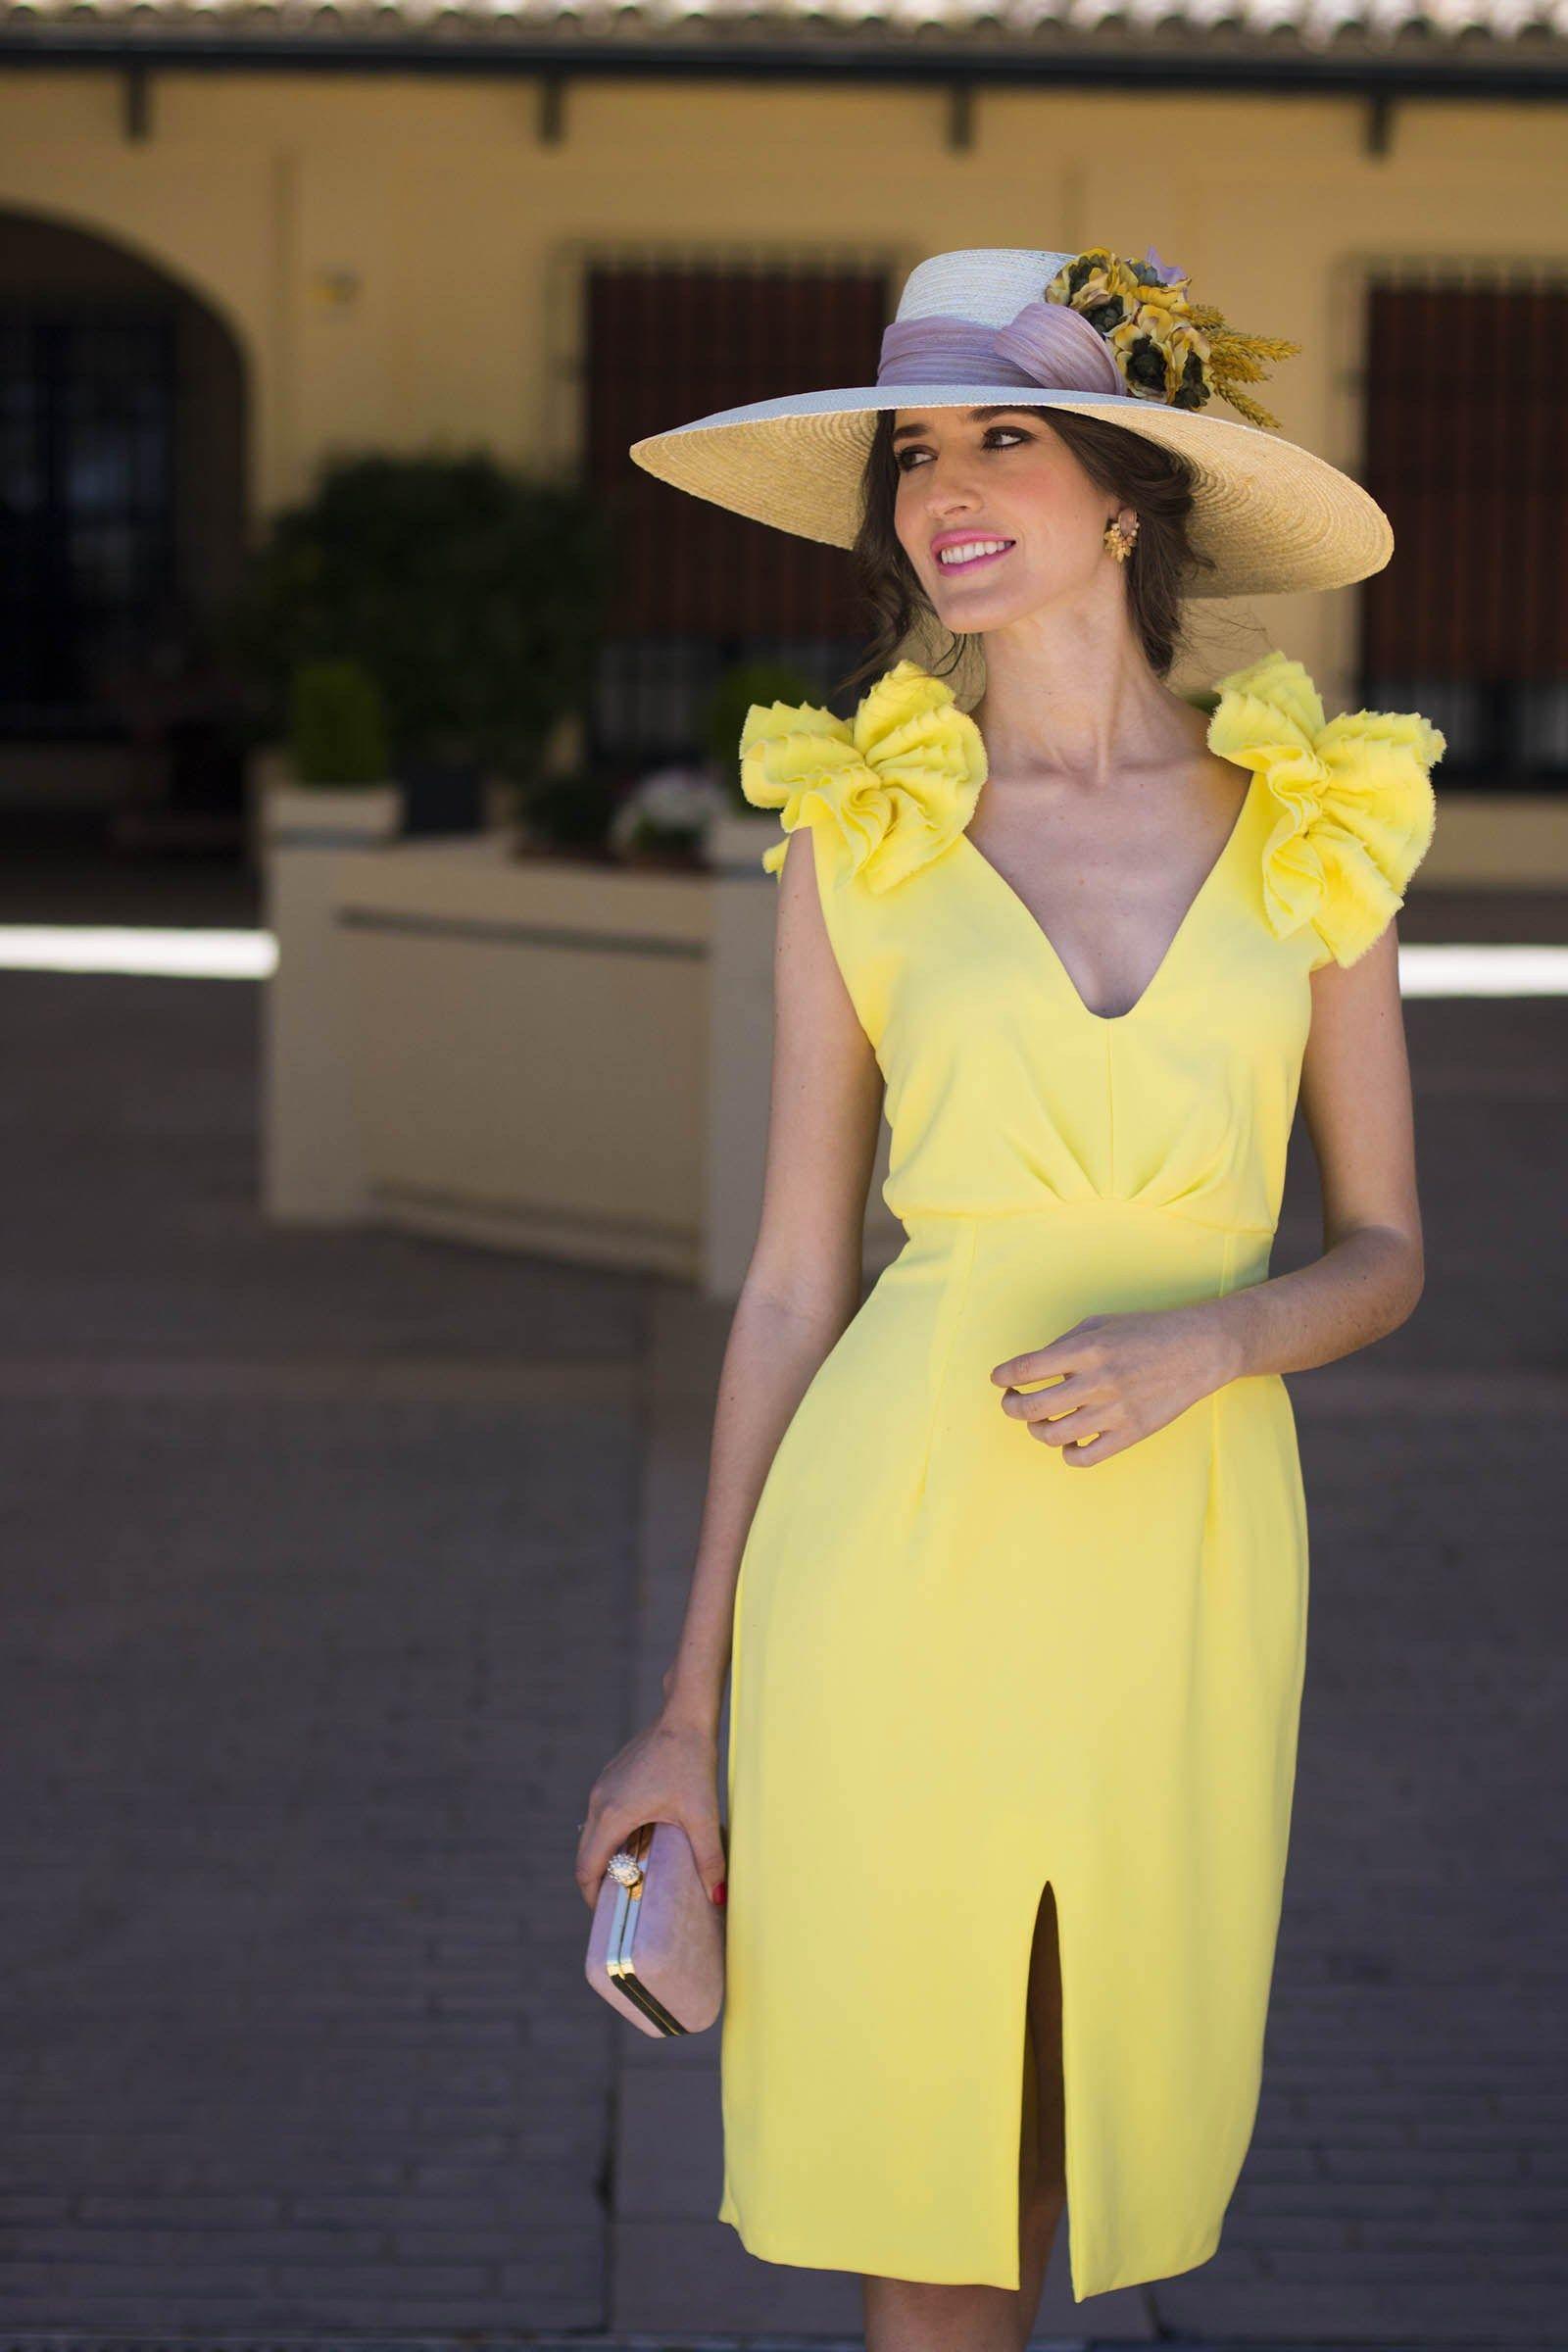 938b60544 Vestido amarillo boda dia tocado